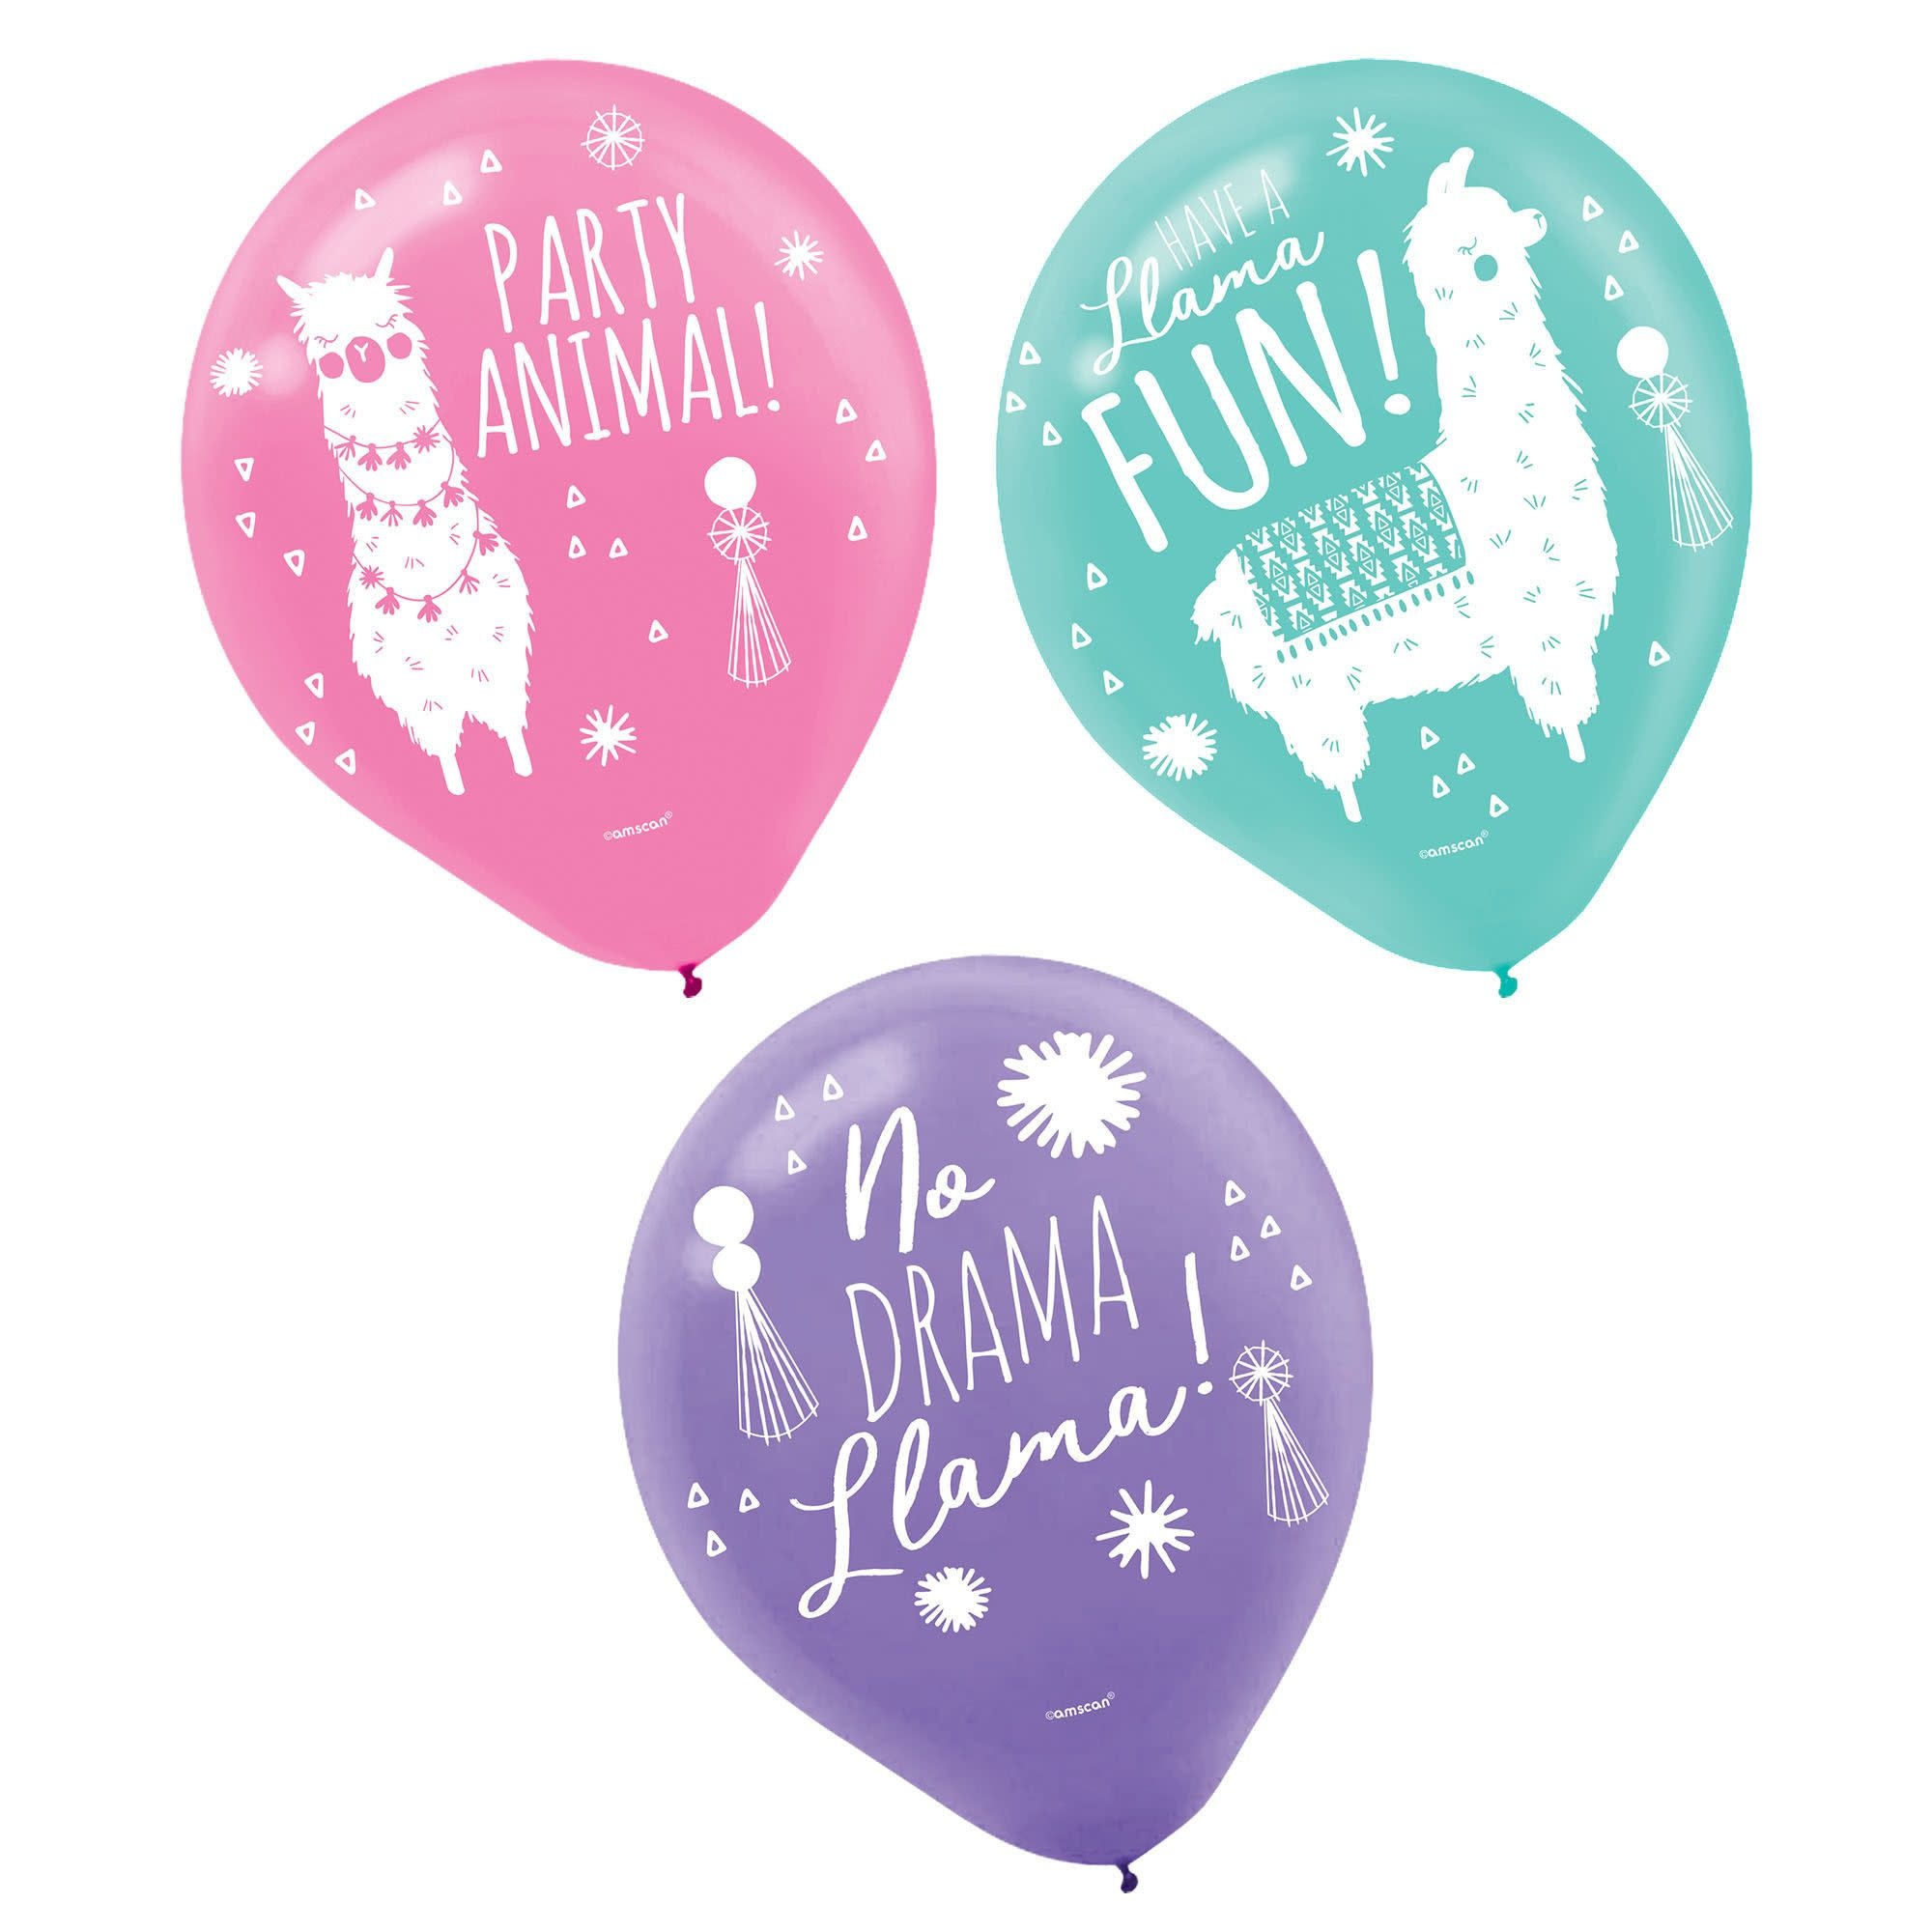 Llama Fun Printed Latex Balloons- 6 Count (Latex Only)